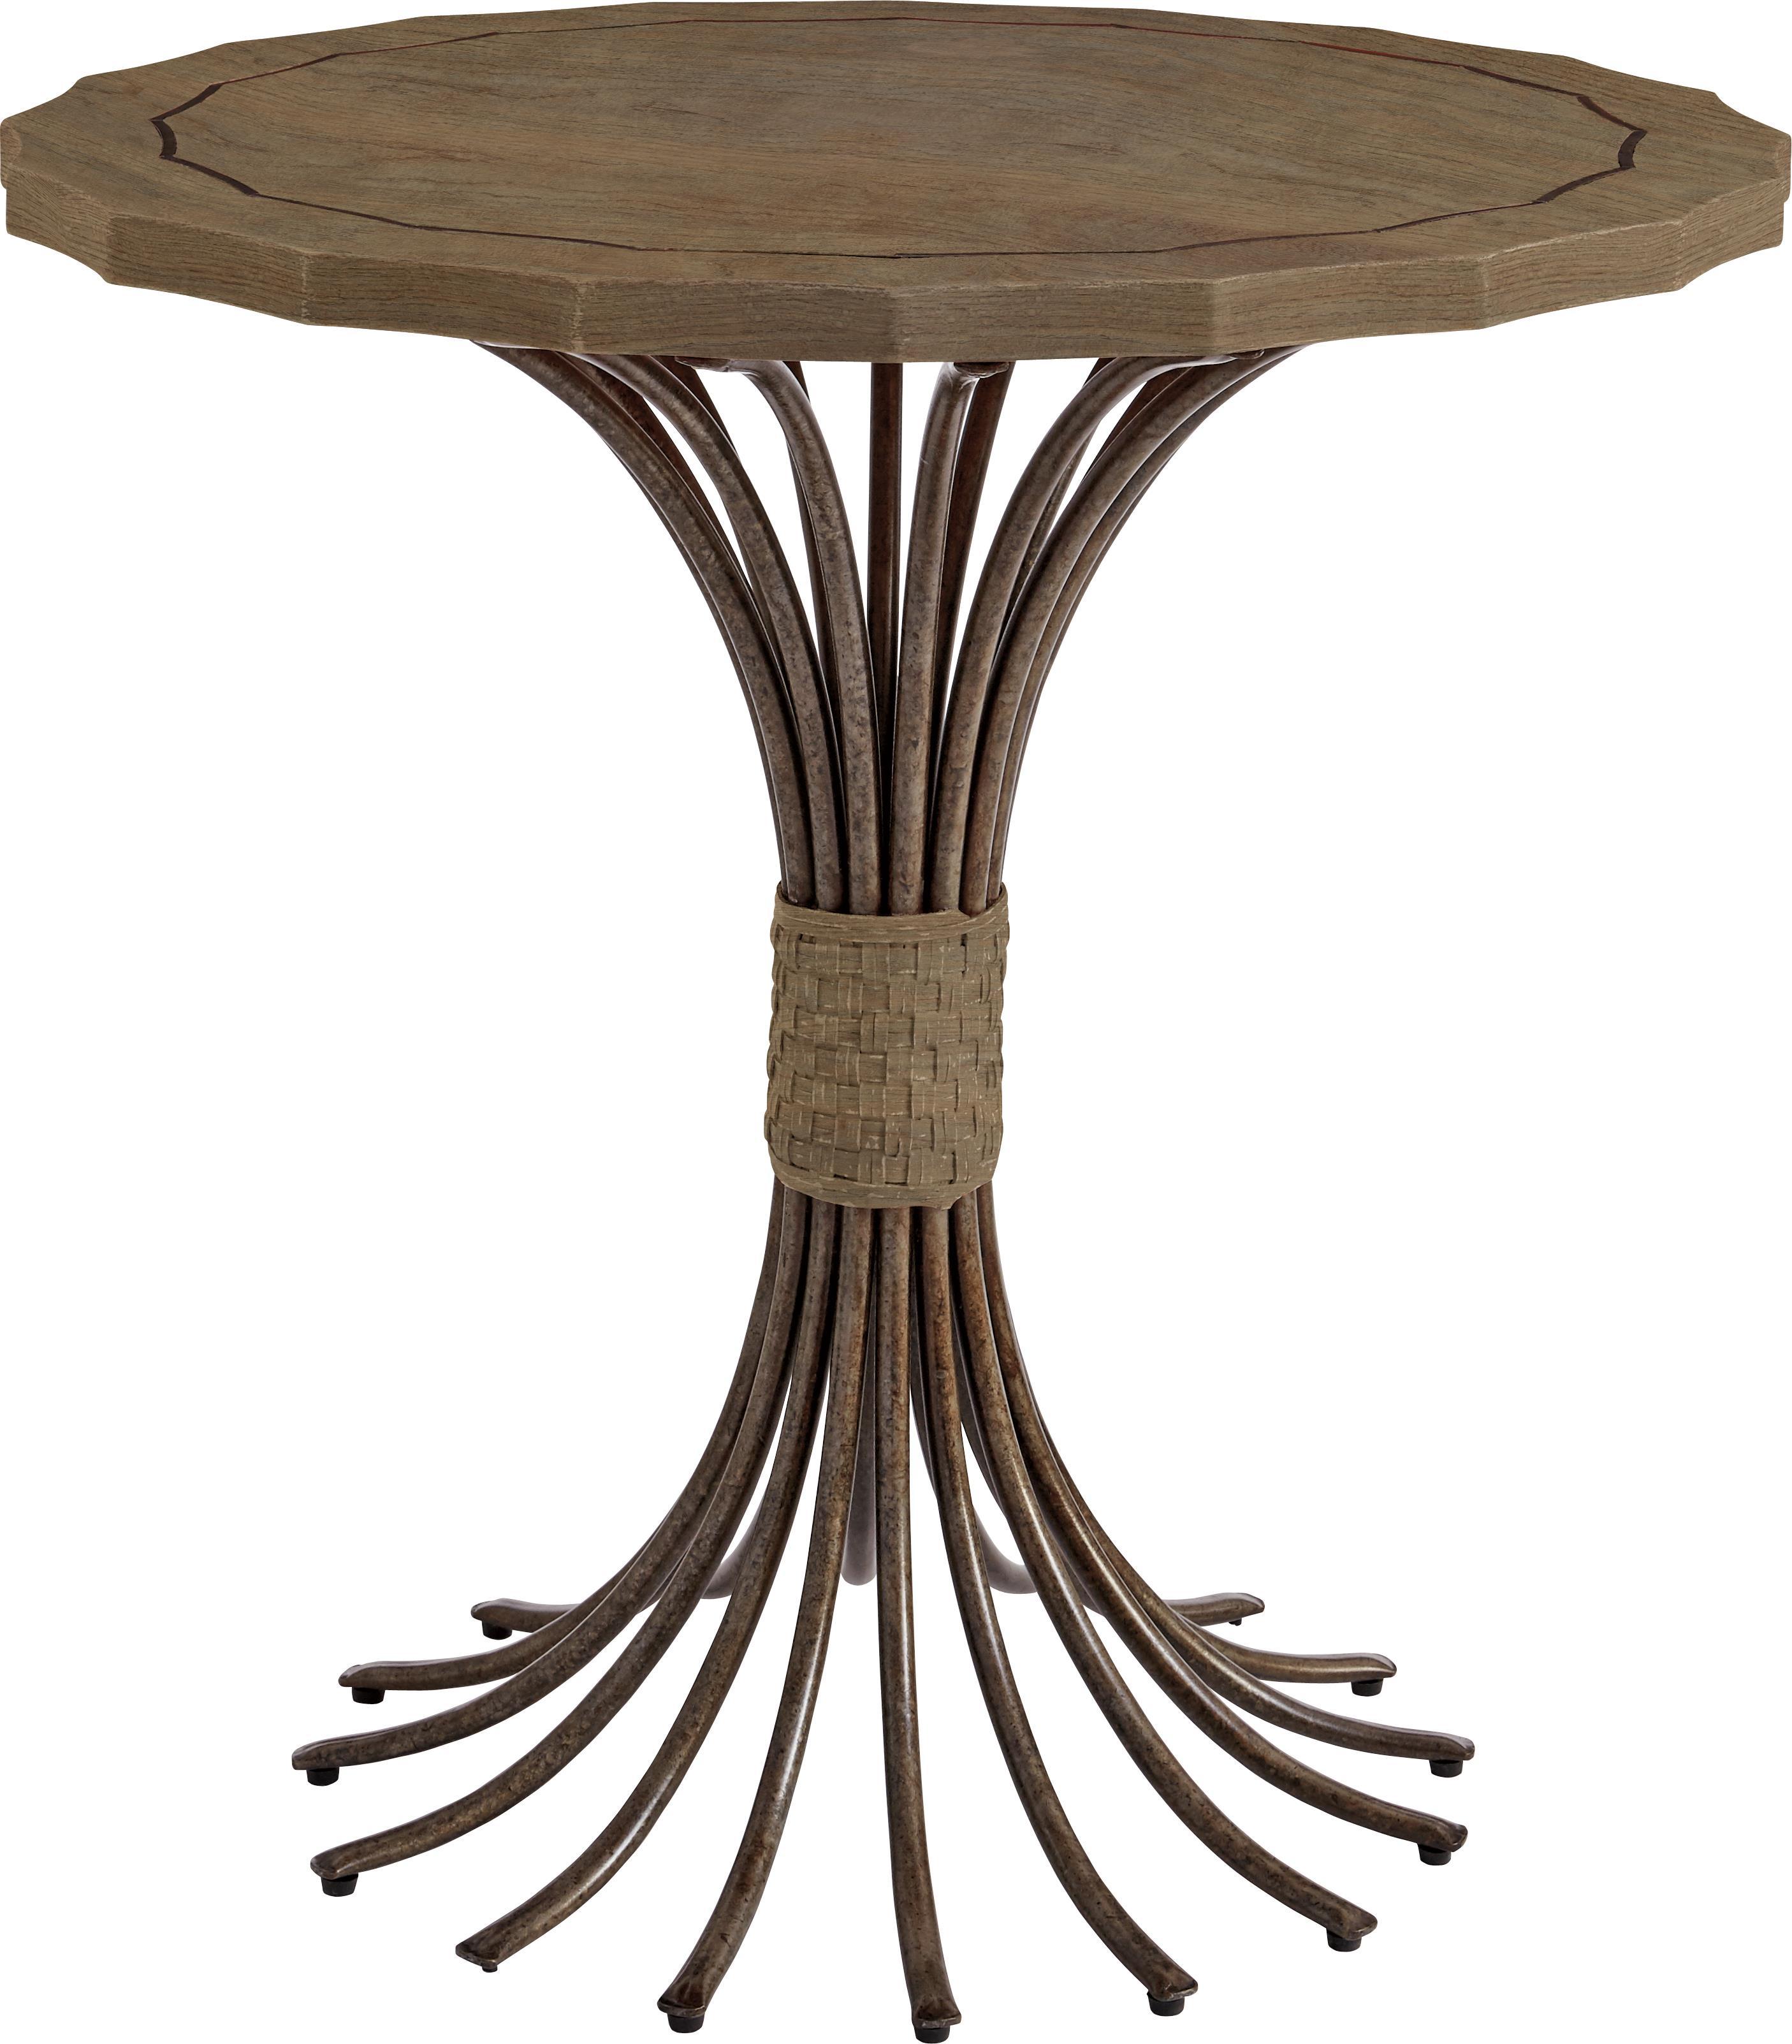 Stanley Furniture Coastal Living Resort Eddy's Landing Lamp Table - Item Number: 062-35-08